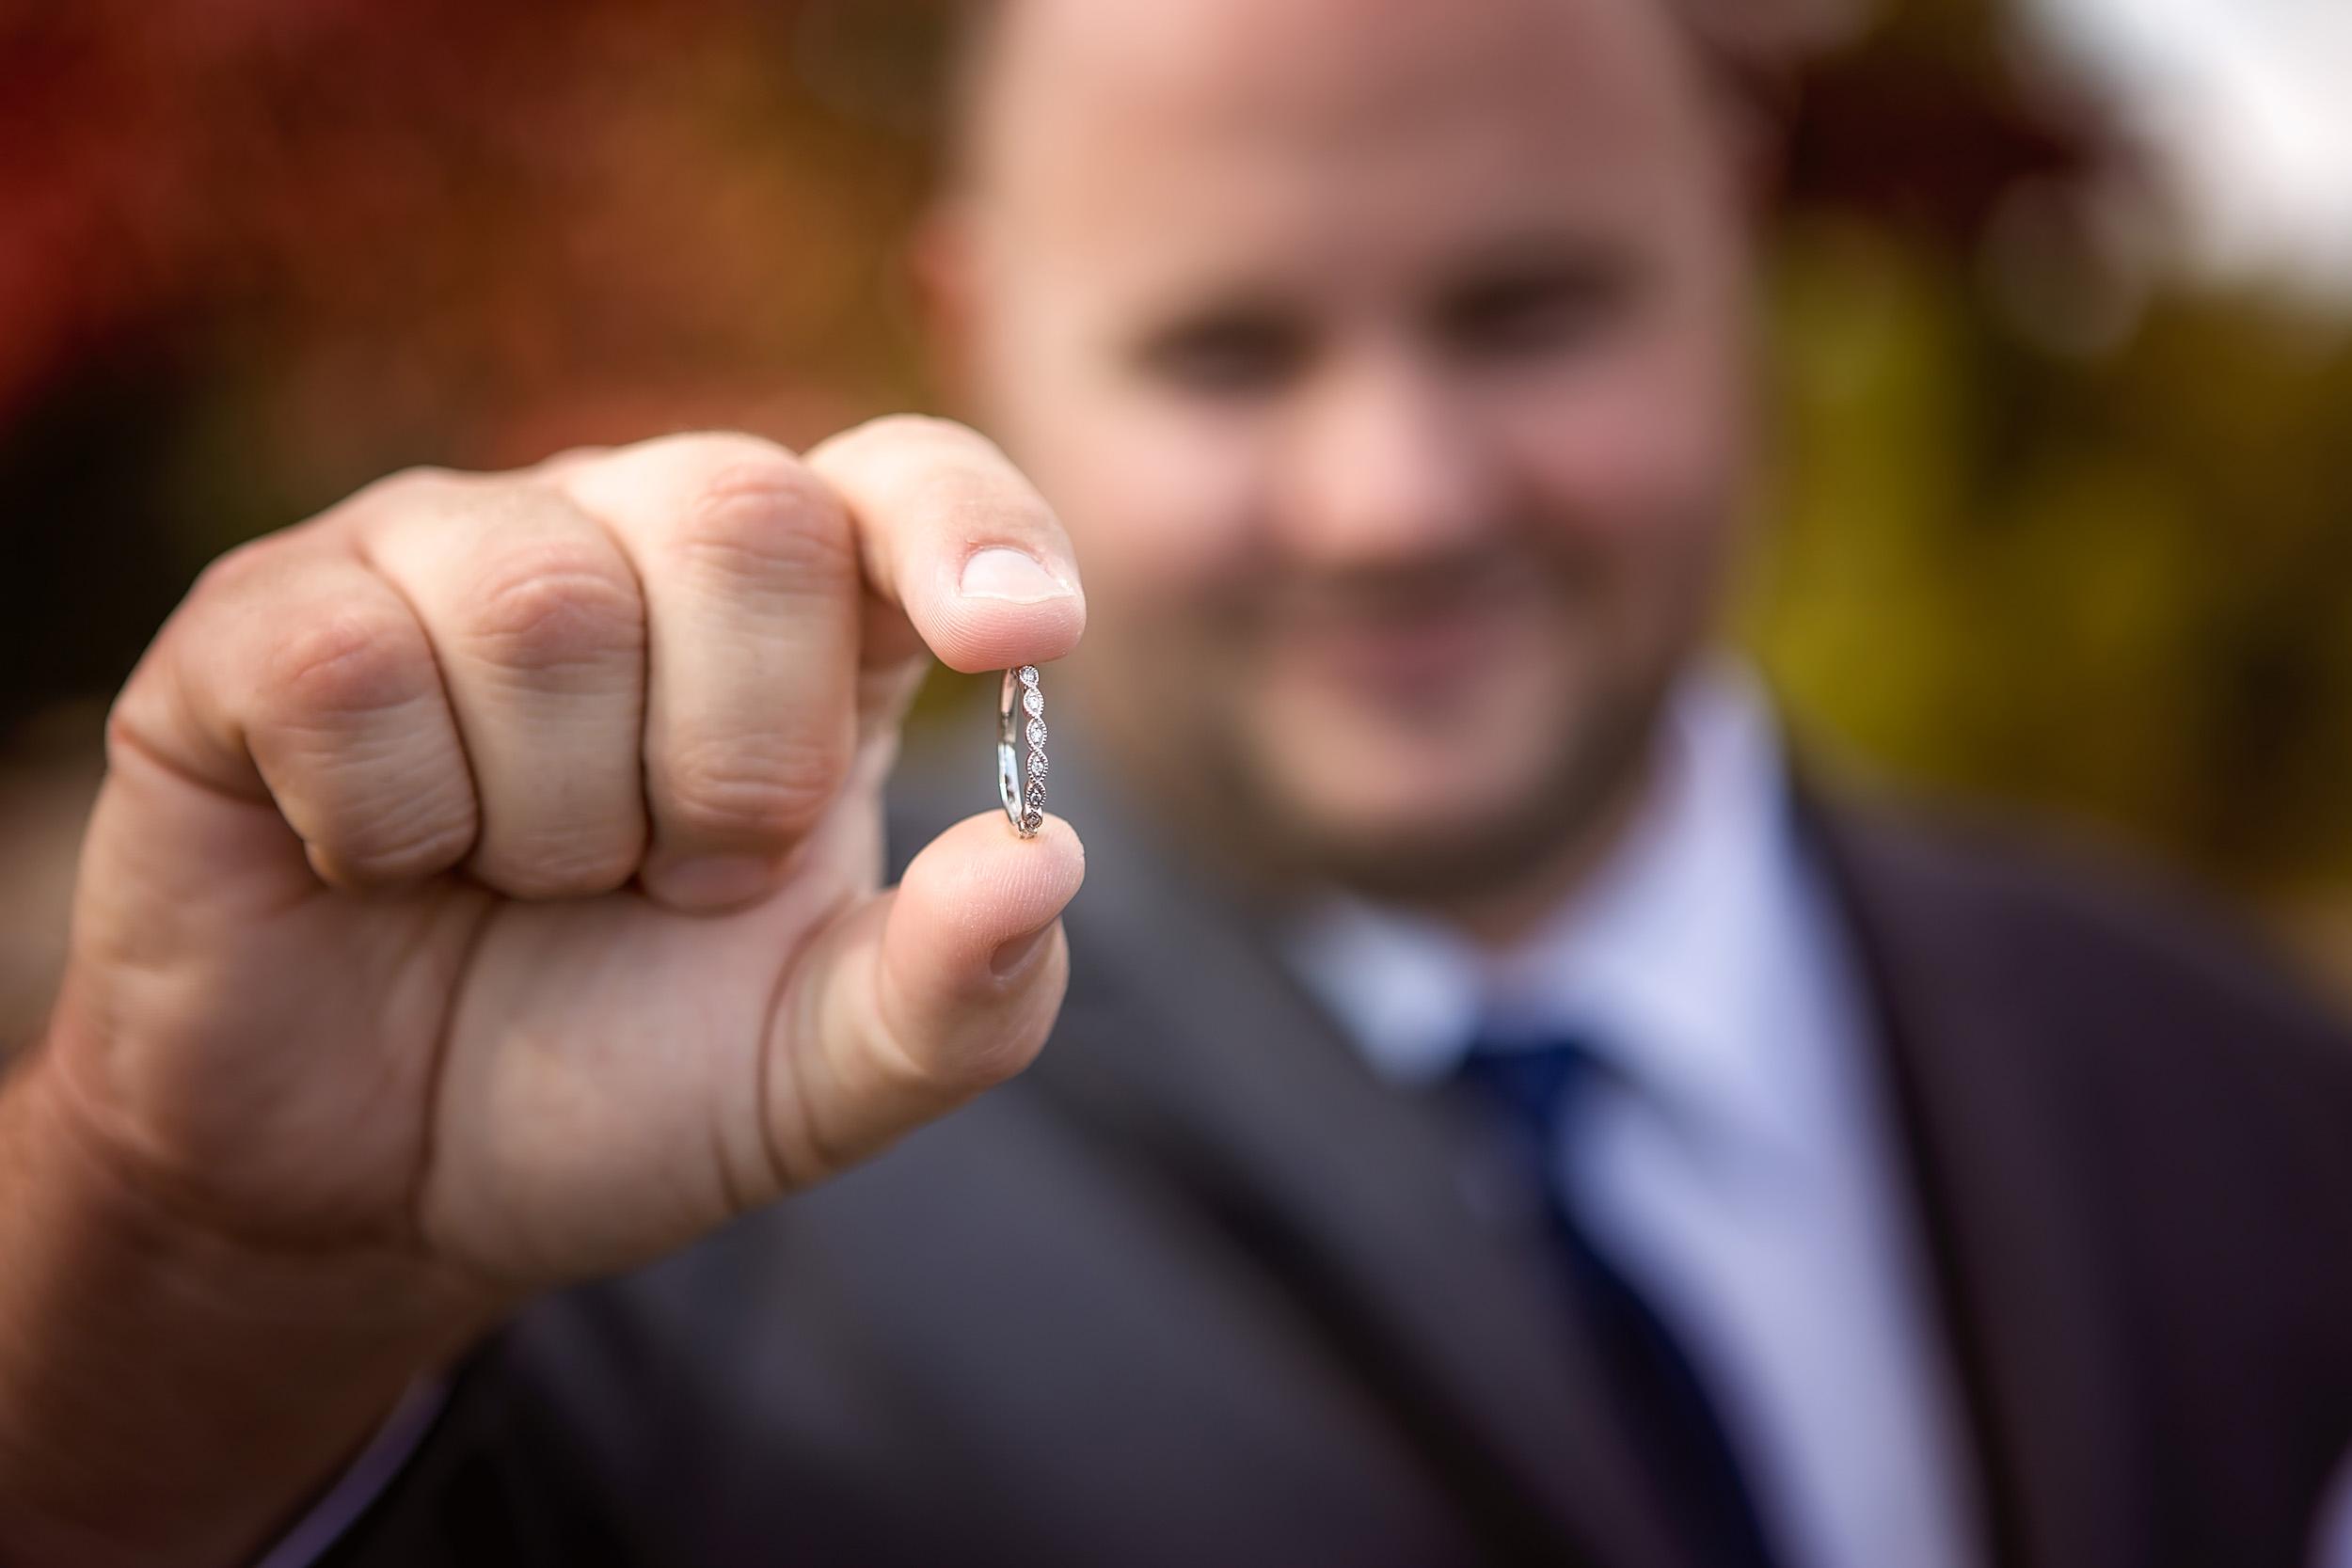 Groomsman shows off wedding ring